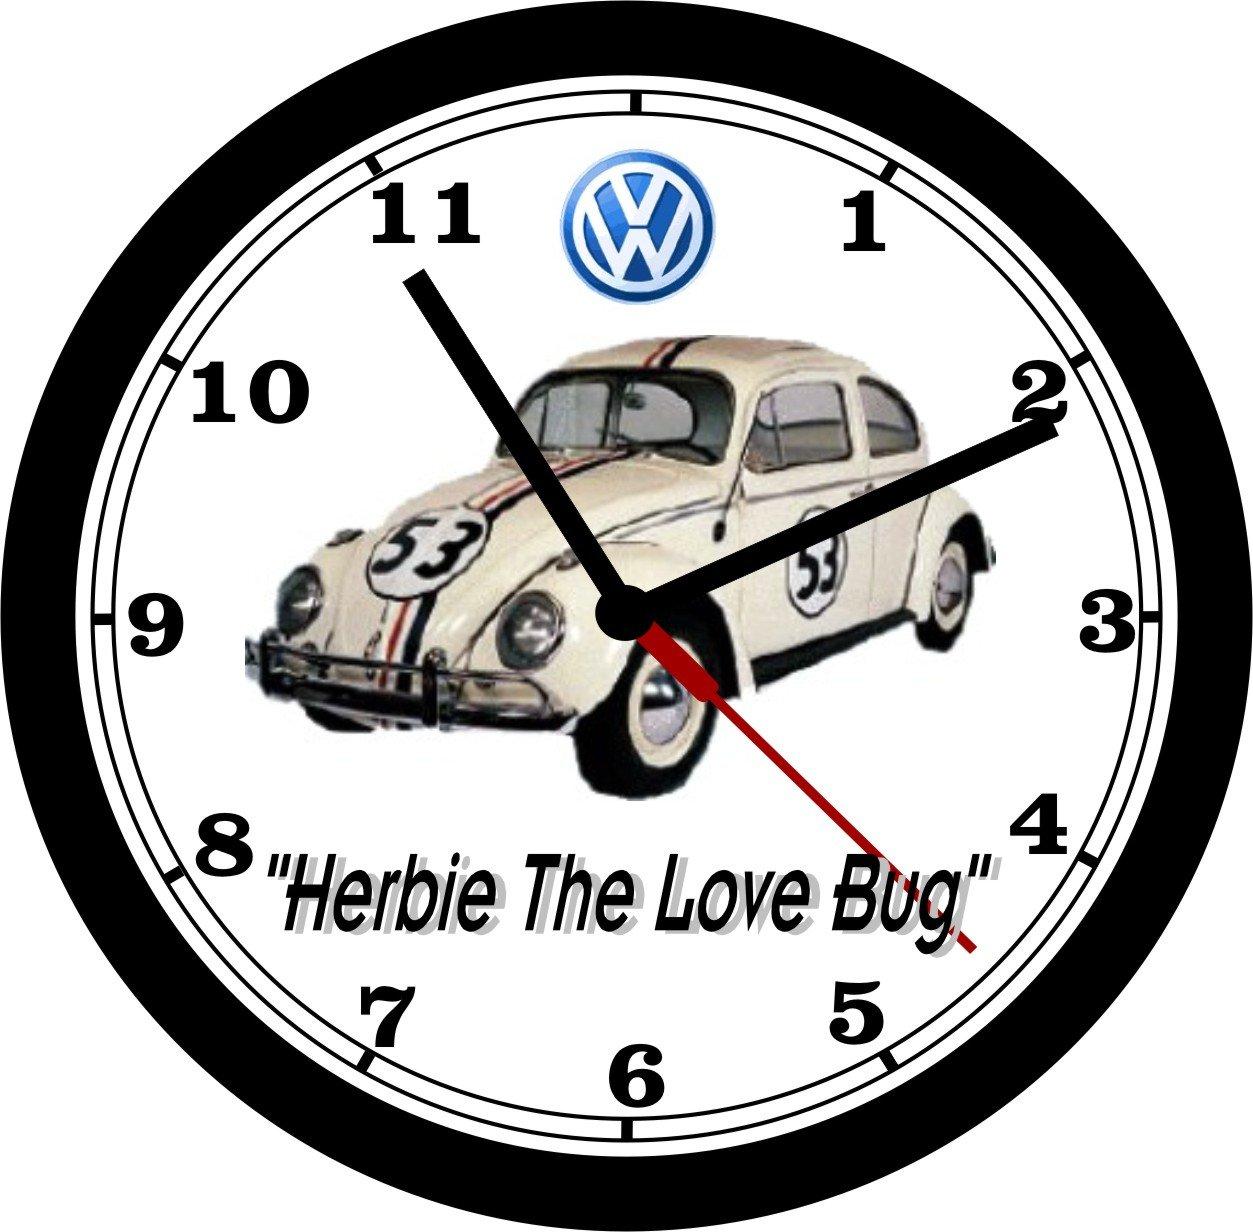 VOLKSWAGEN BEETLE ''HERBIE THE LOVE BUG'' WALL CLOCK-FREE USA SHIP!